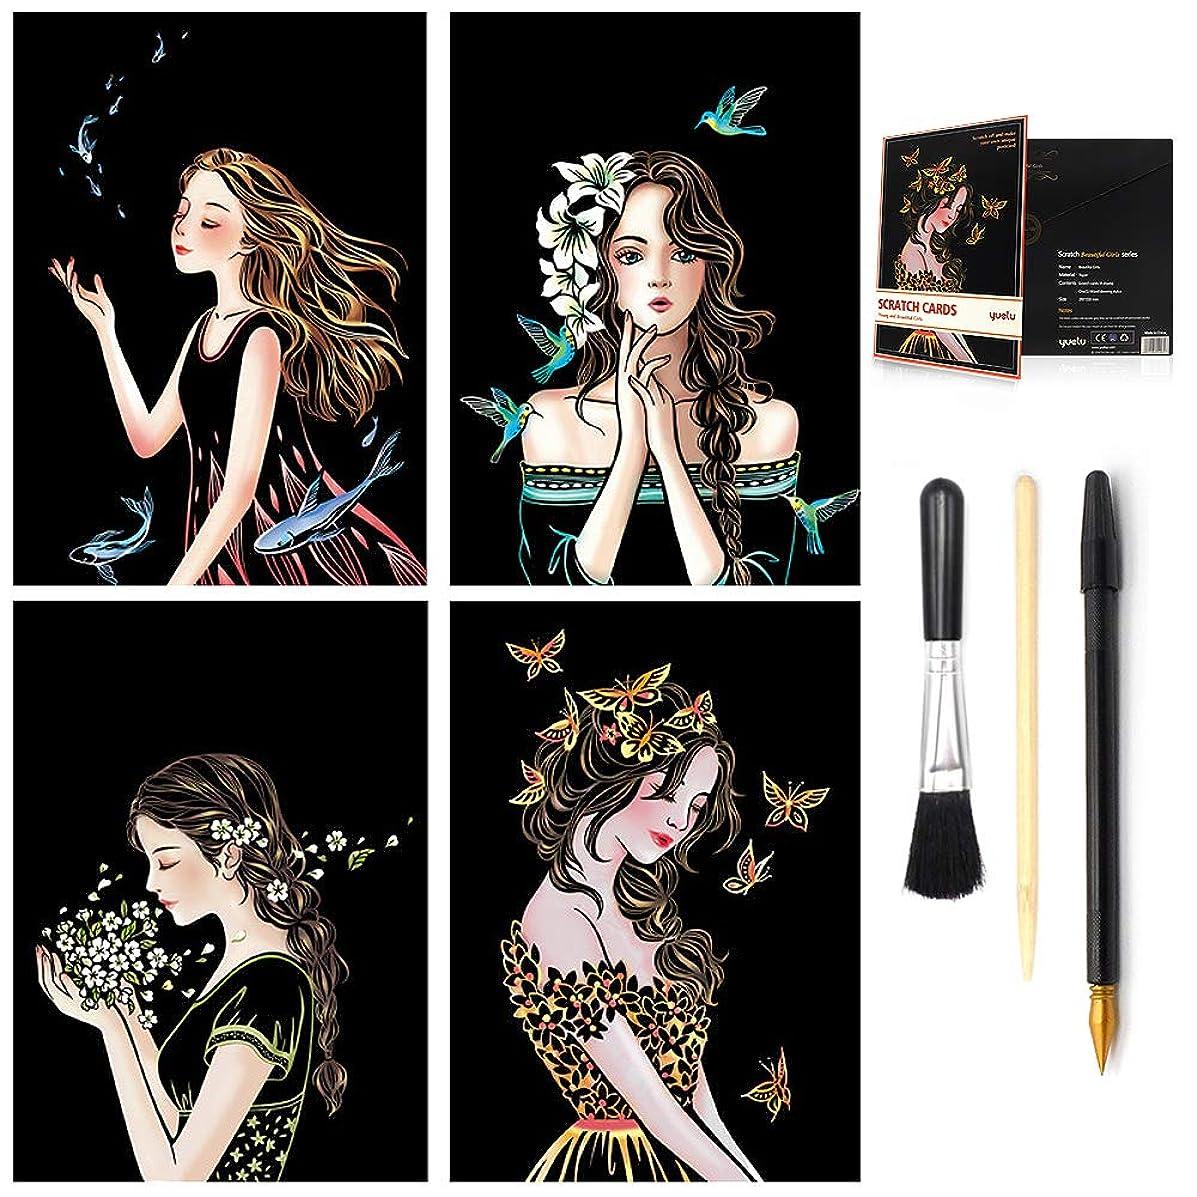 Scratch & Sketch Art Paper (A4) for Kids & Adults, Rainbow Girls Flower Painting Scratchboard, Art&Craft, Engraving Art Set: 4 Sheets Scratch Cards & Scratch Drawing Pen, Clean Brush (Beautiful Girls)